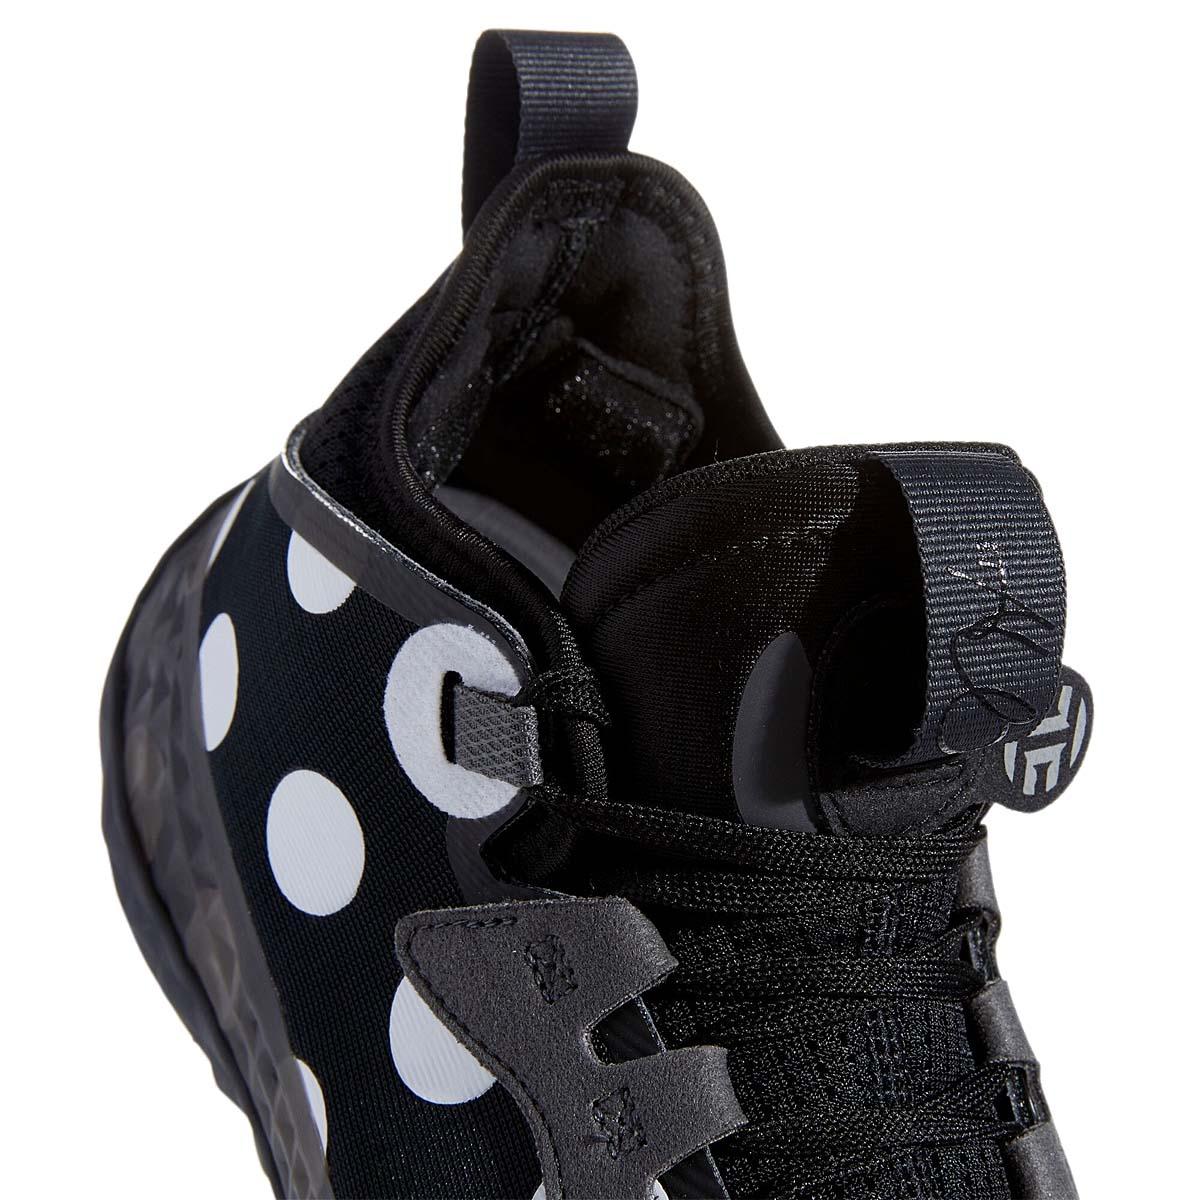 adidas HARDEN VOL. 5 FUTURENATURAL CORE BLACK / FOOTWEAR WHITE / TEAM DARK GRAY H68597 アディダス ハーデン Vol.5 フューチャーナチュラル ブラック/ホワイト